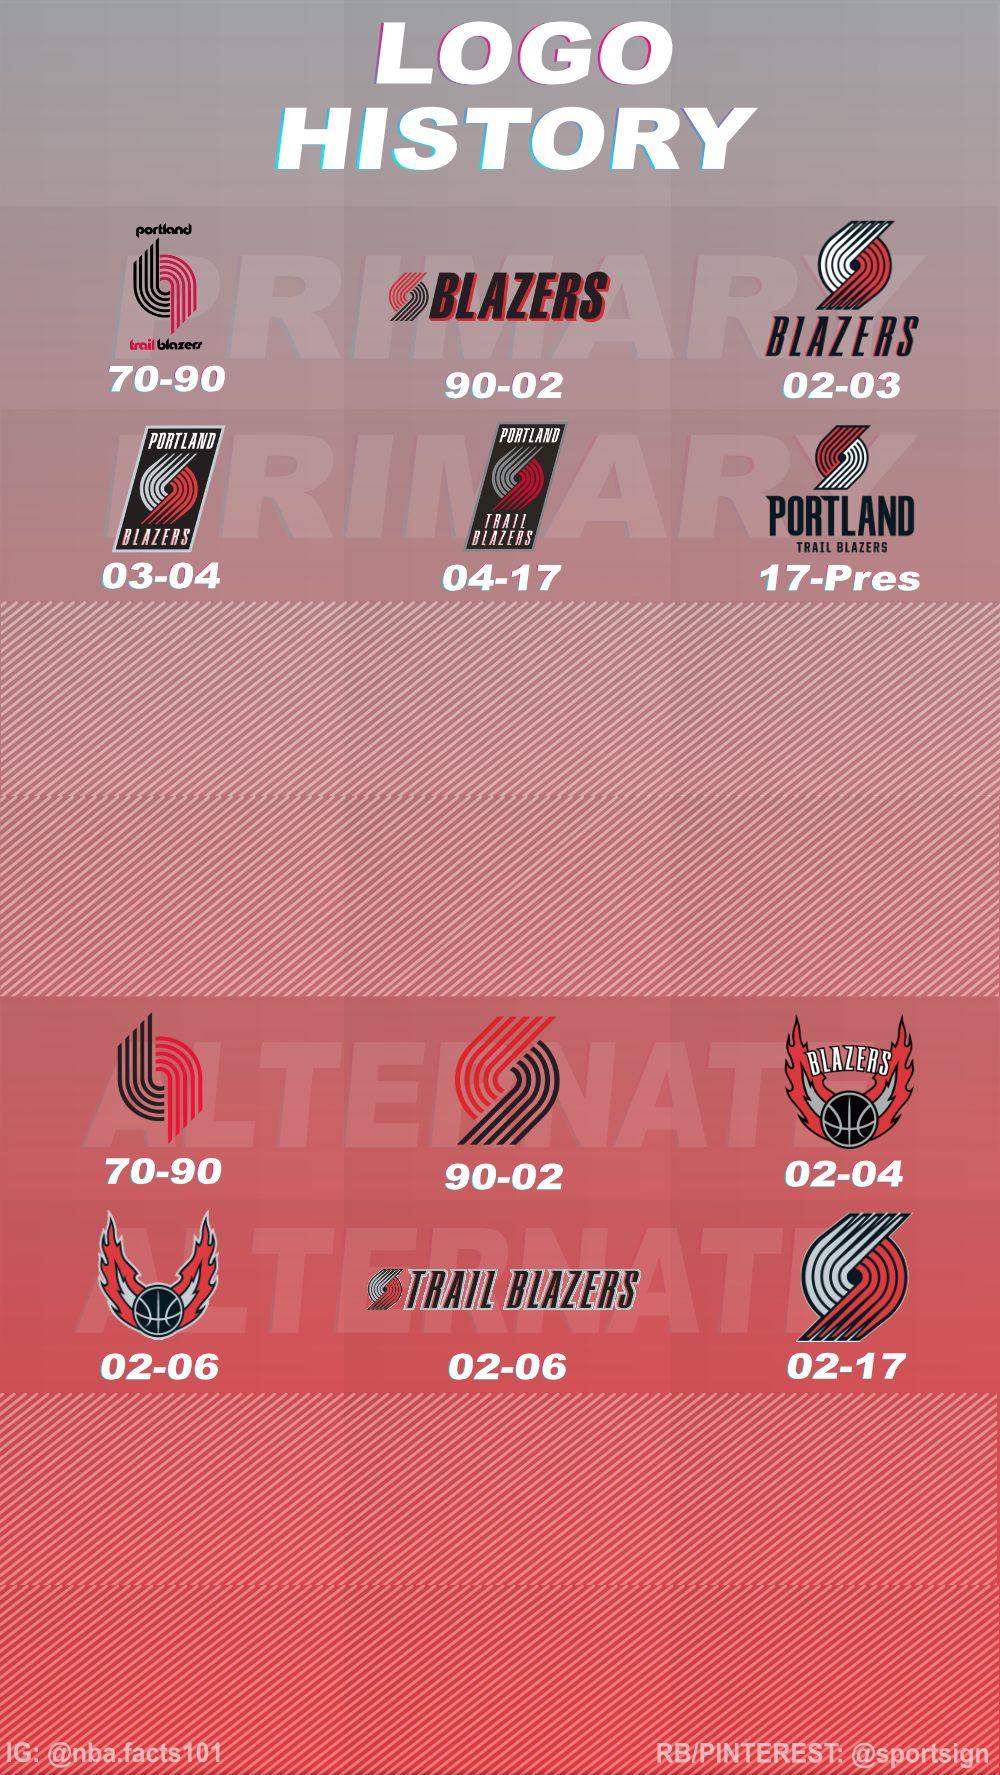 History of the NBA Basketball Team Portland Trailblazers